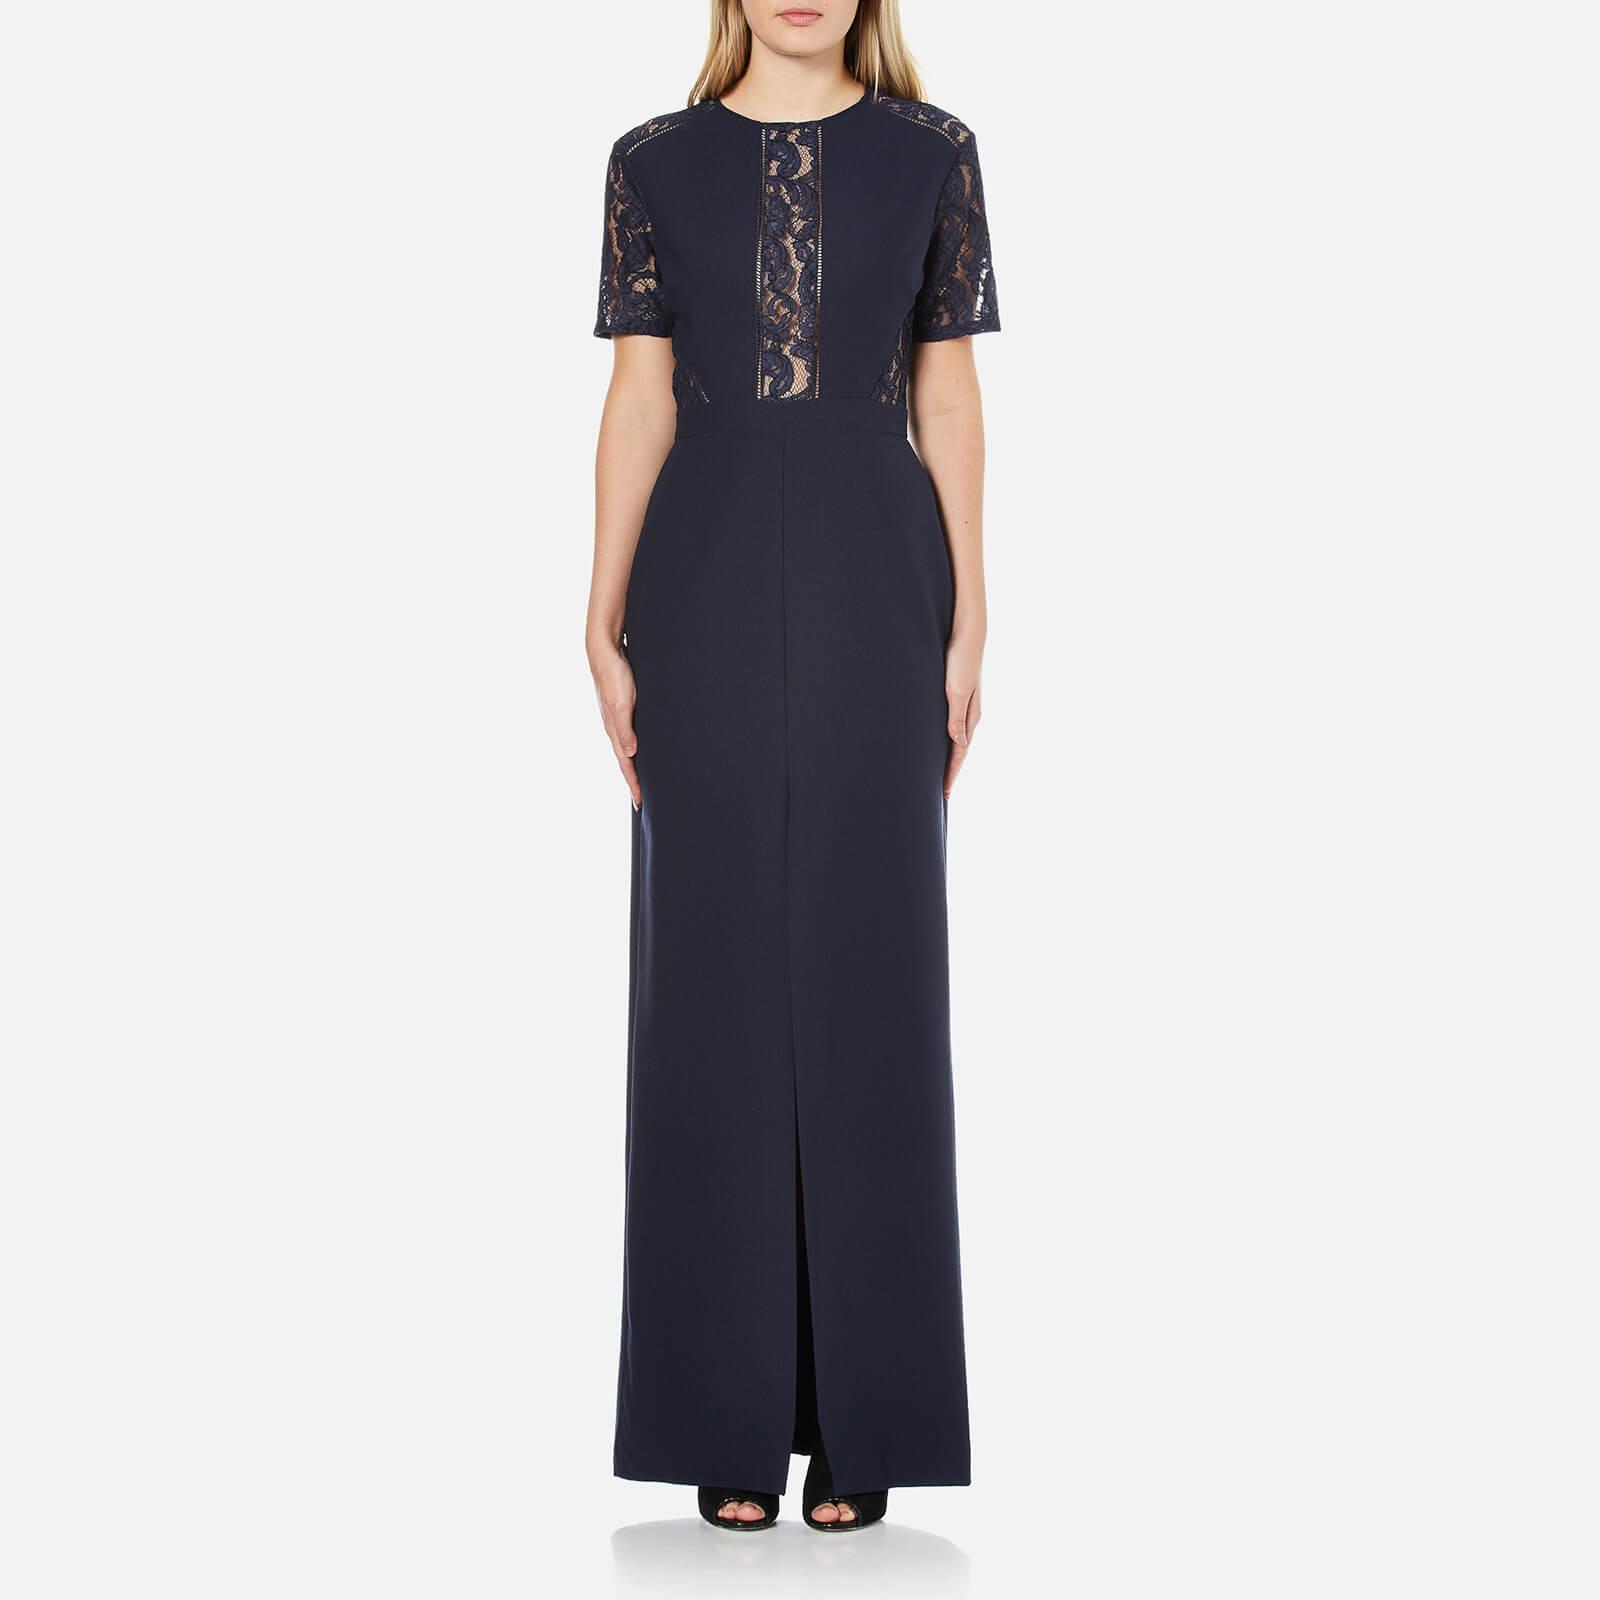 5ed1e7e2142 Perseverance Women s Short Sleeve Lace Panel Maxi Dress - Navy ...